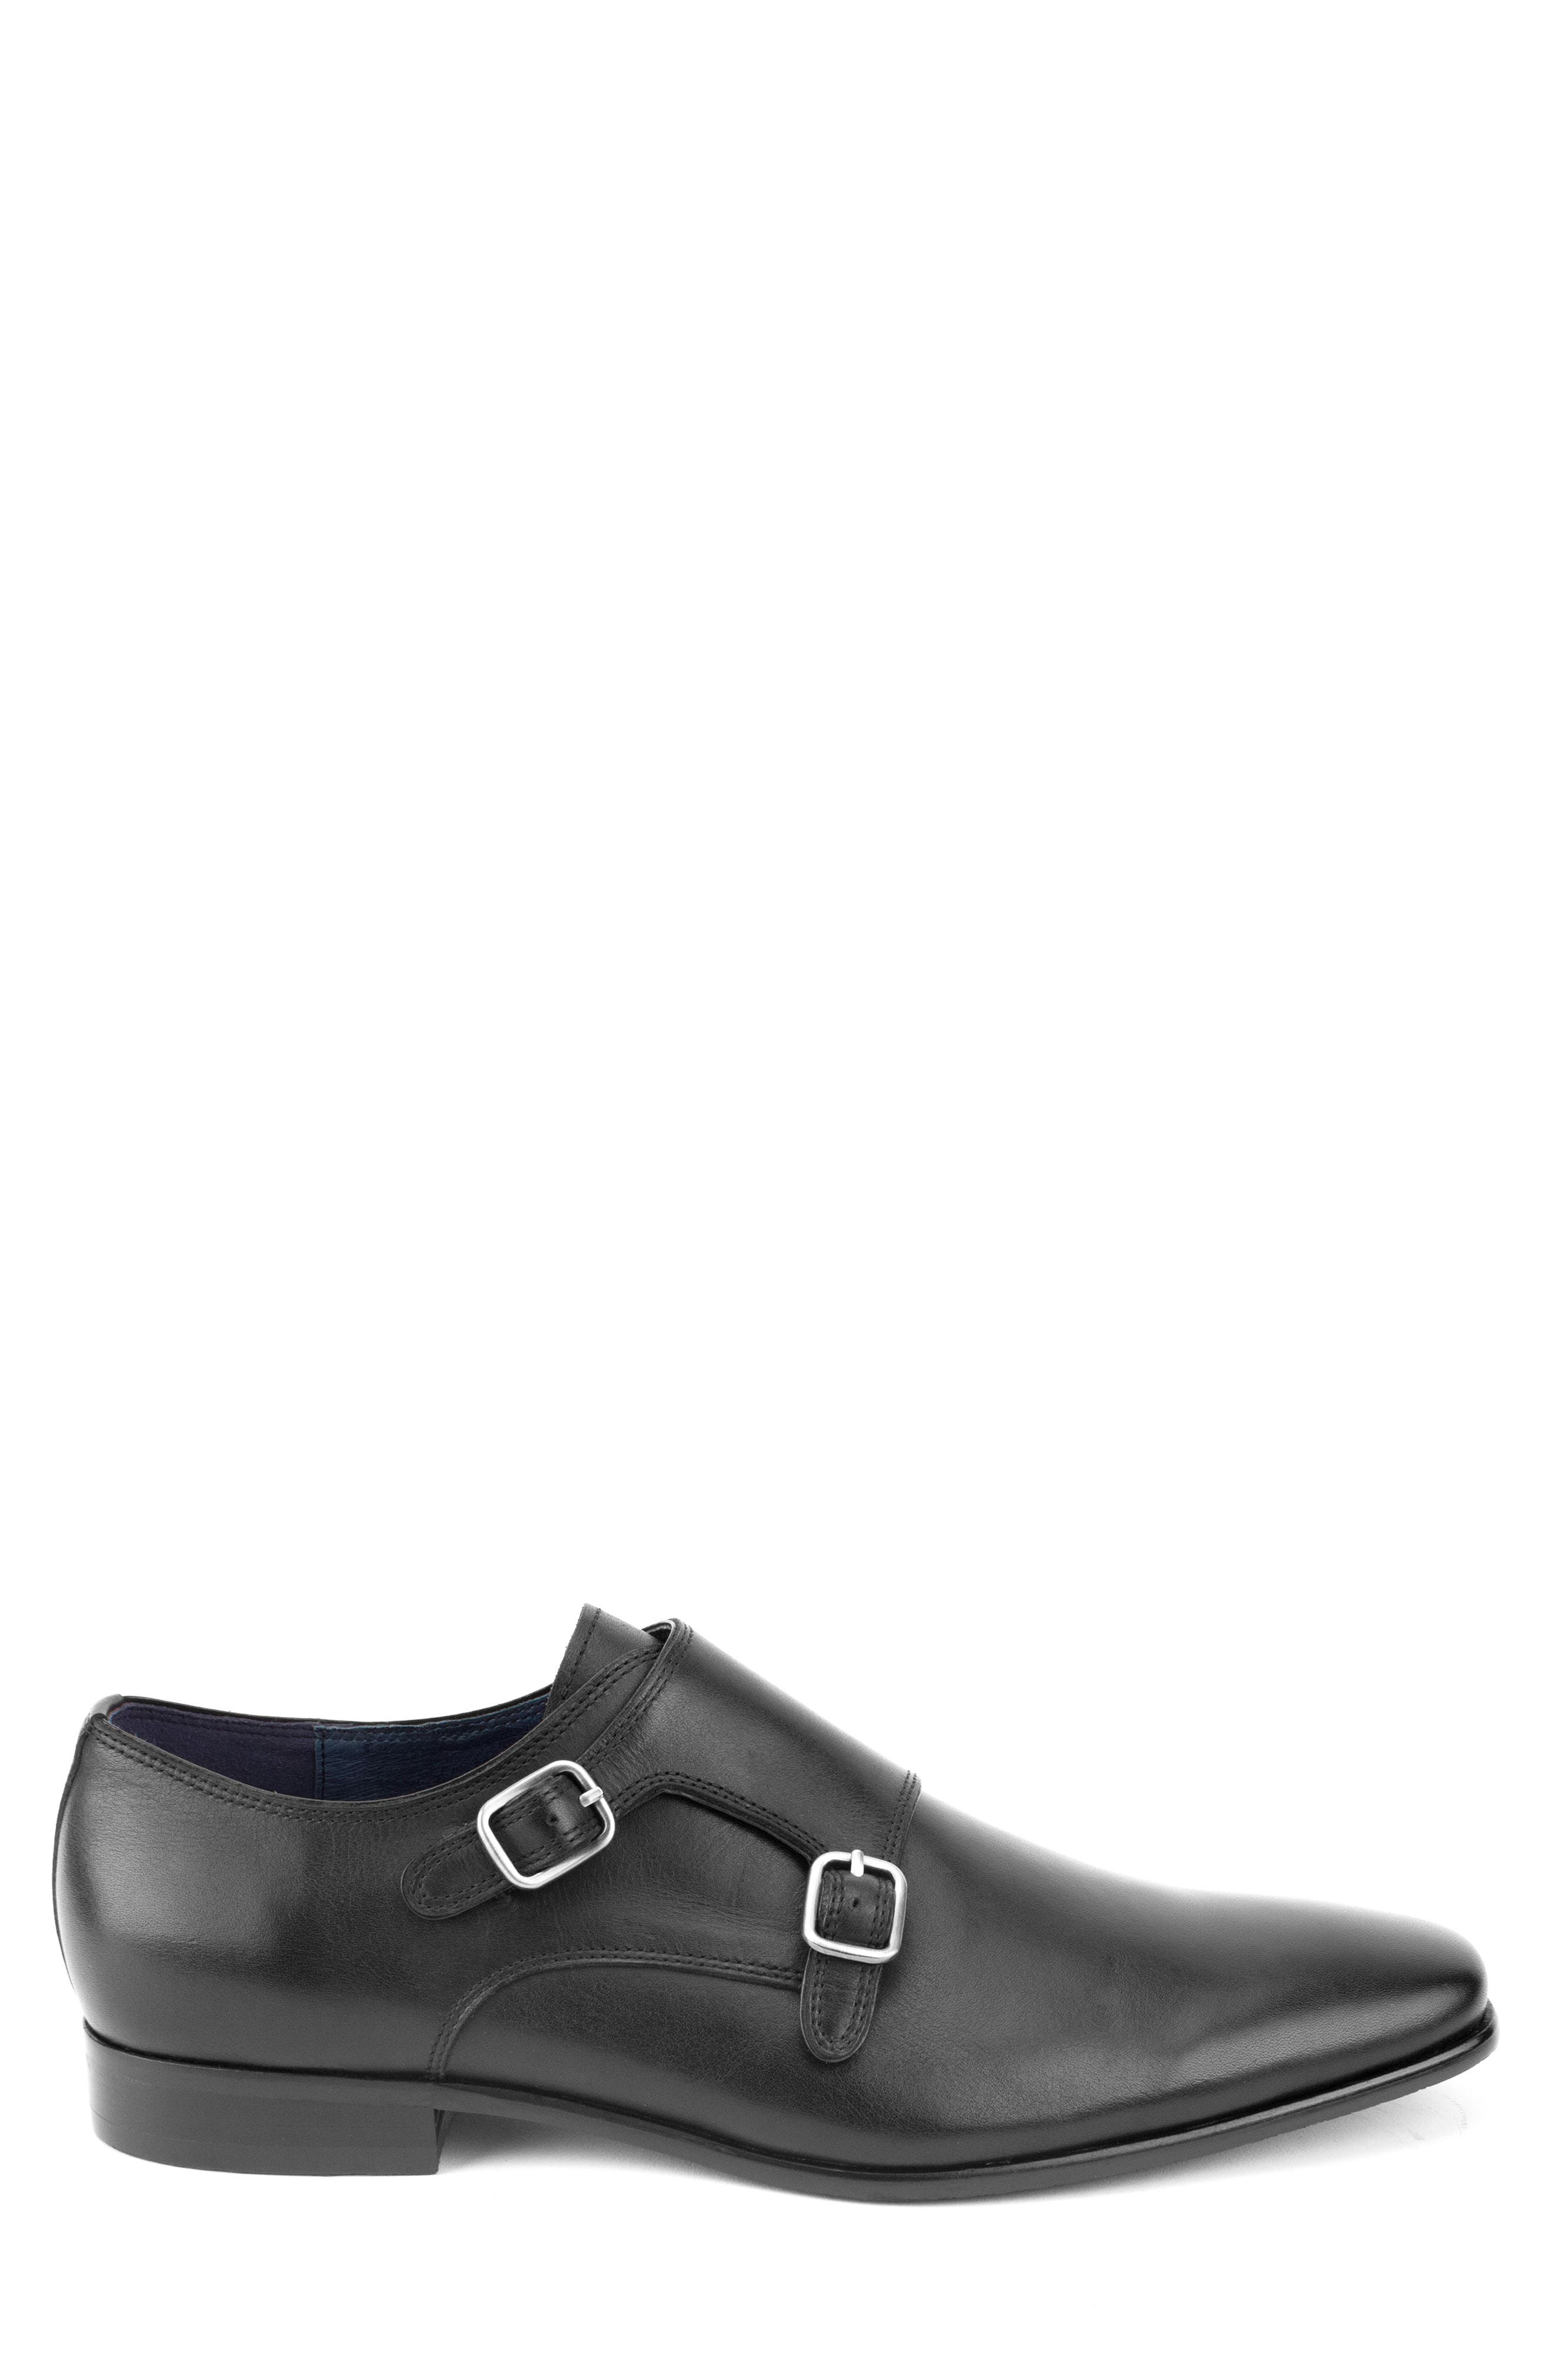 Luke Double Buckle Monk Shoe,                             Alternate thumbnail 3, color,                             BLACK LEATHER